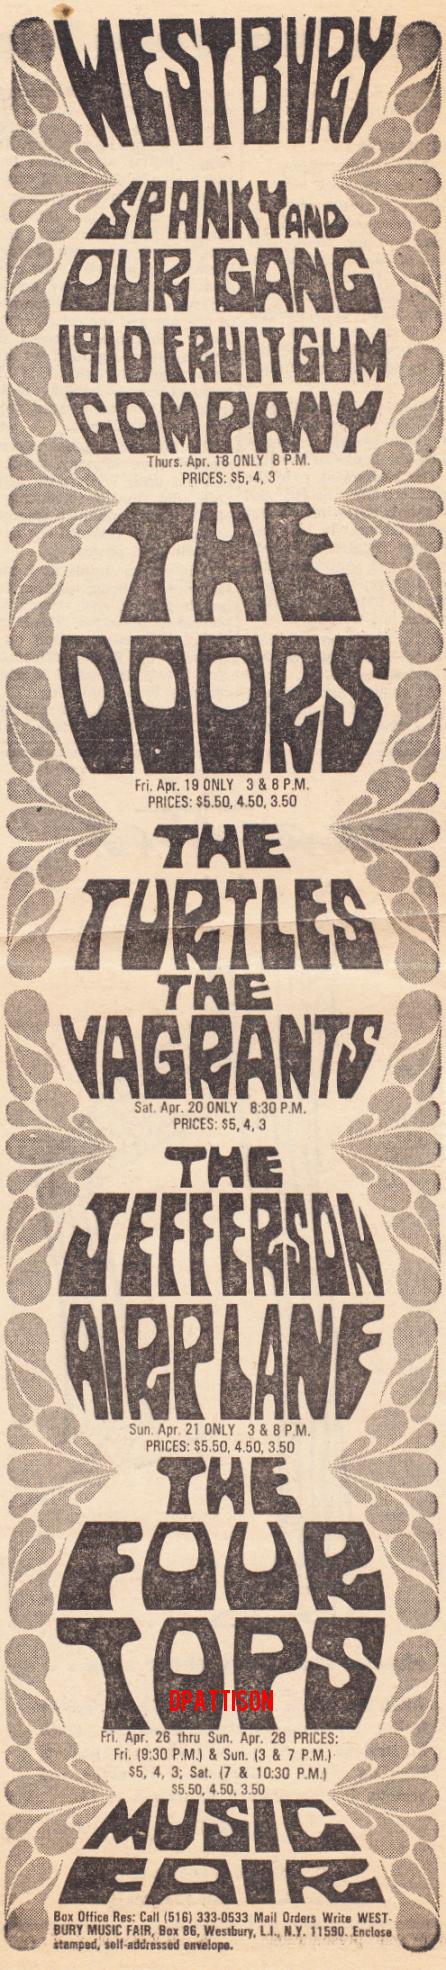 The Doors - Westbury Music Fair - Print Ad